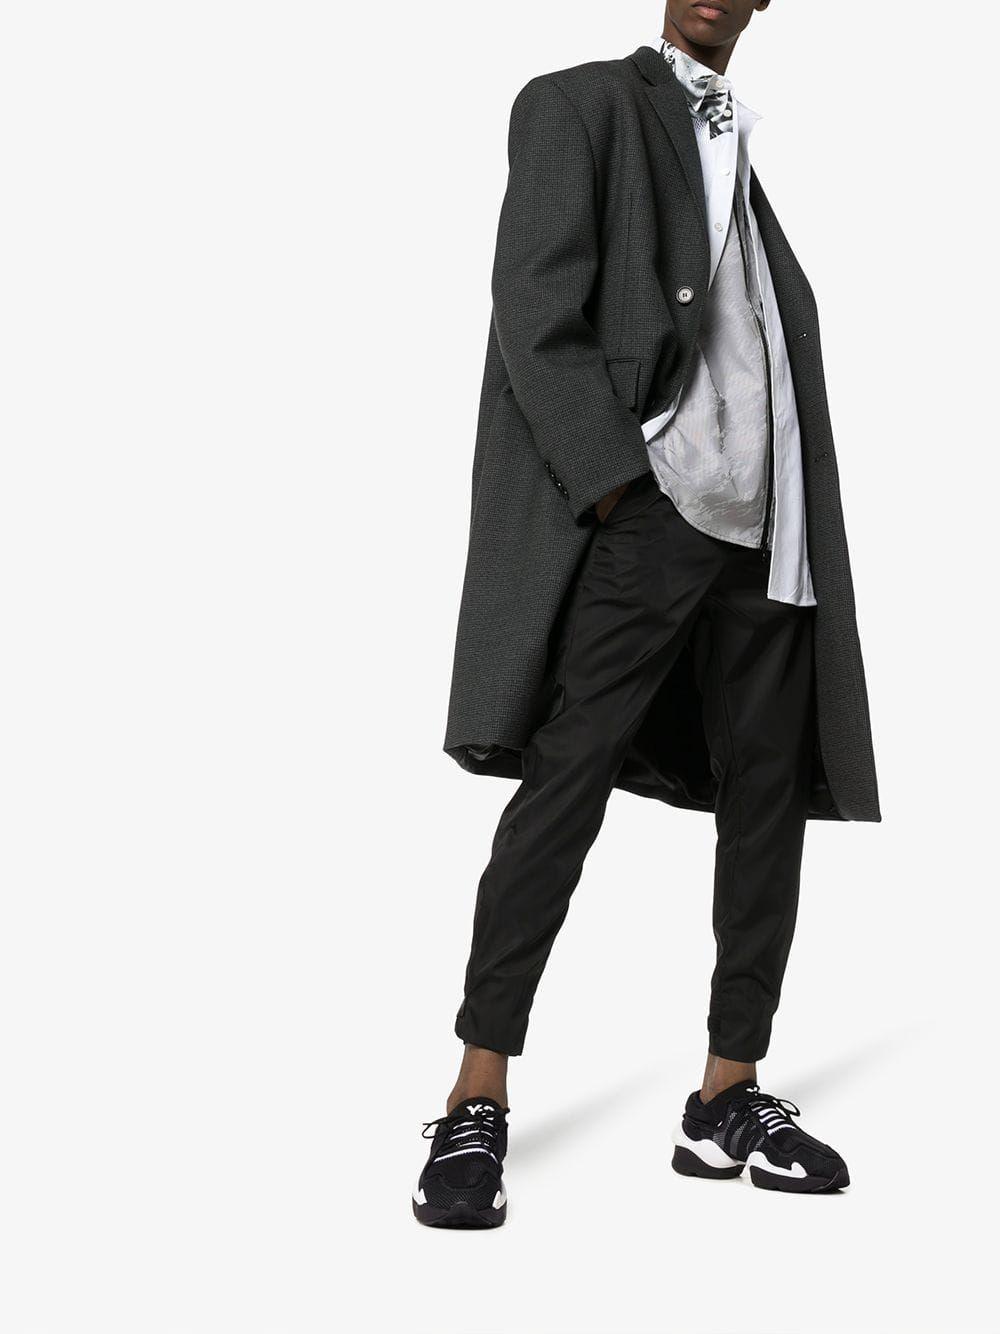 a549546b0 Y-3 Y-3 BLACK KAIWA POD LOW-TOP SNEAKERS.  y-3  shoes